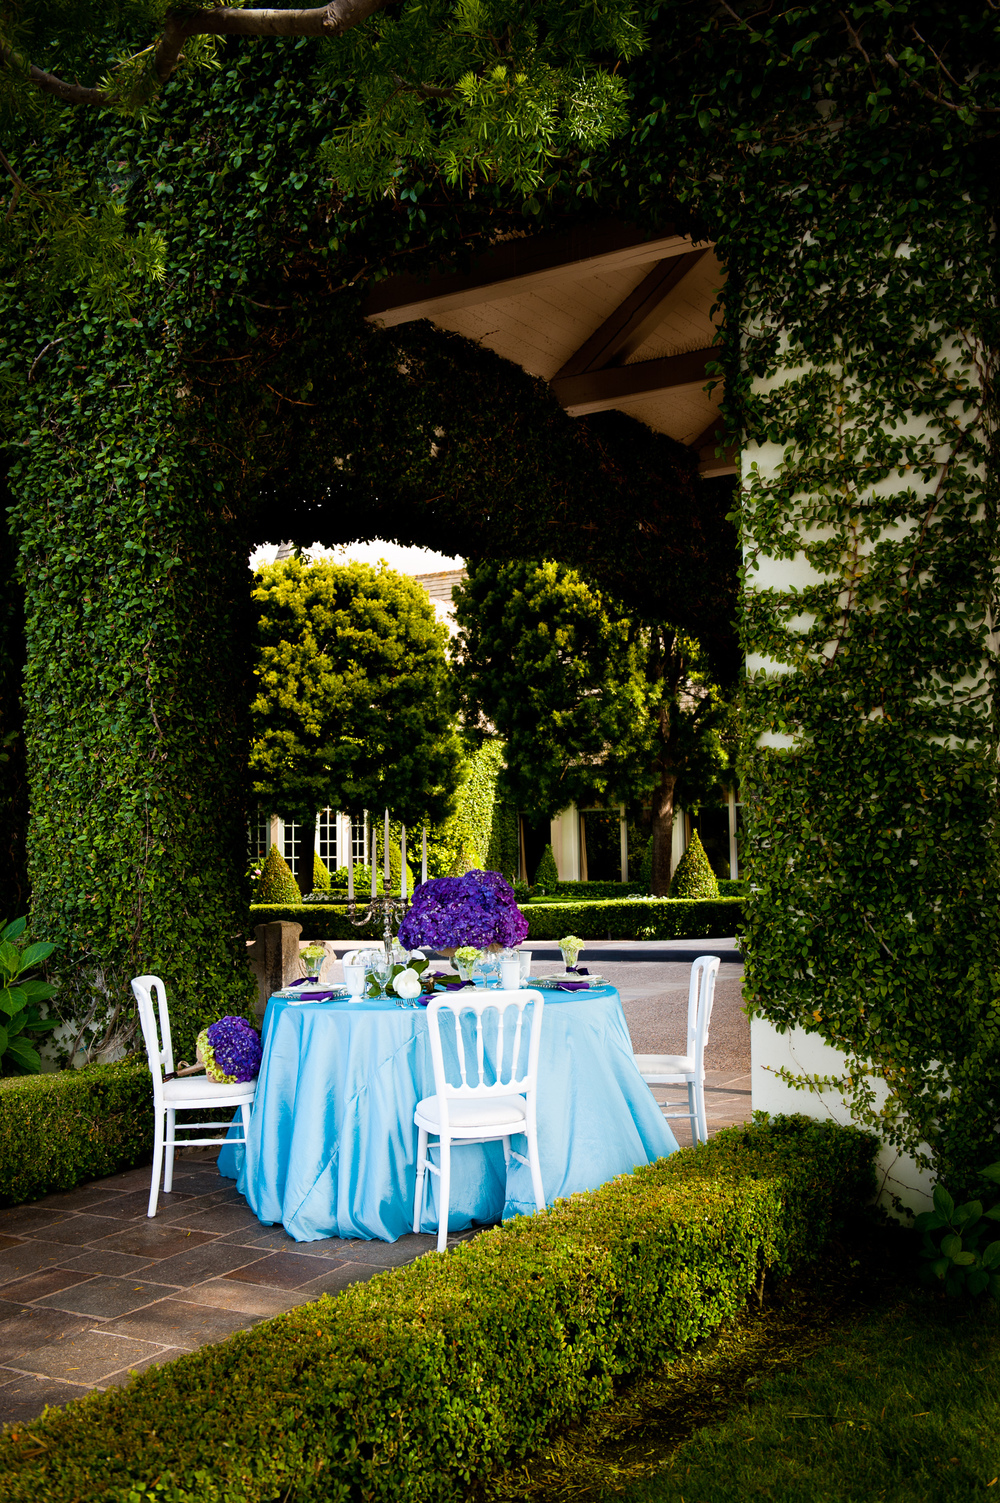 stewart_bertrand_wedding_photography_sdsw13-1005.jpg